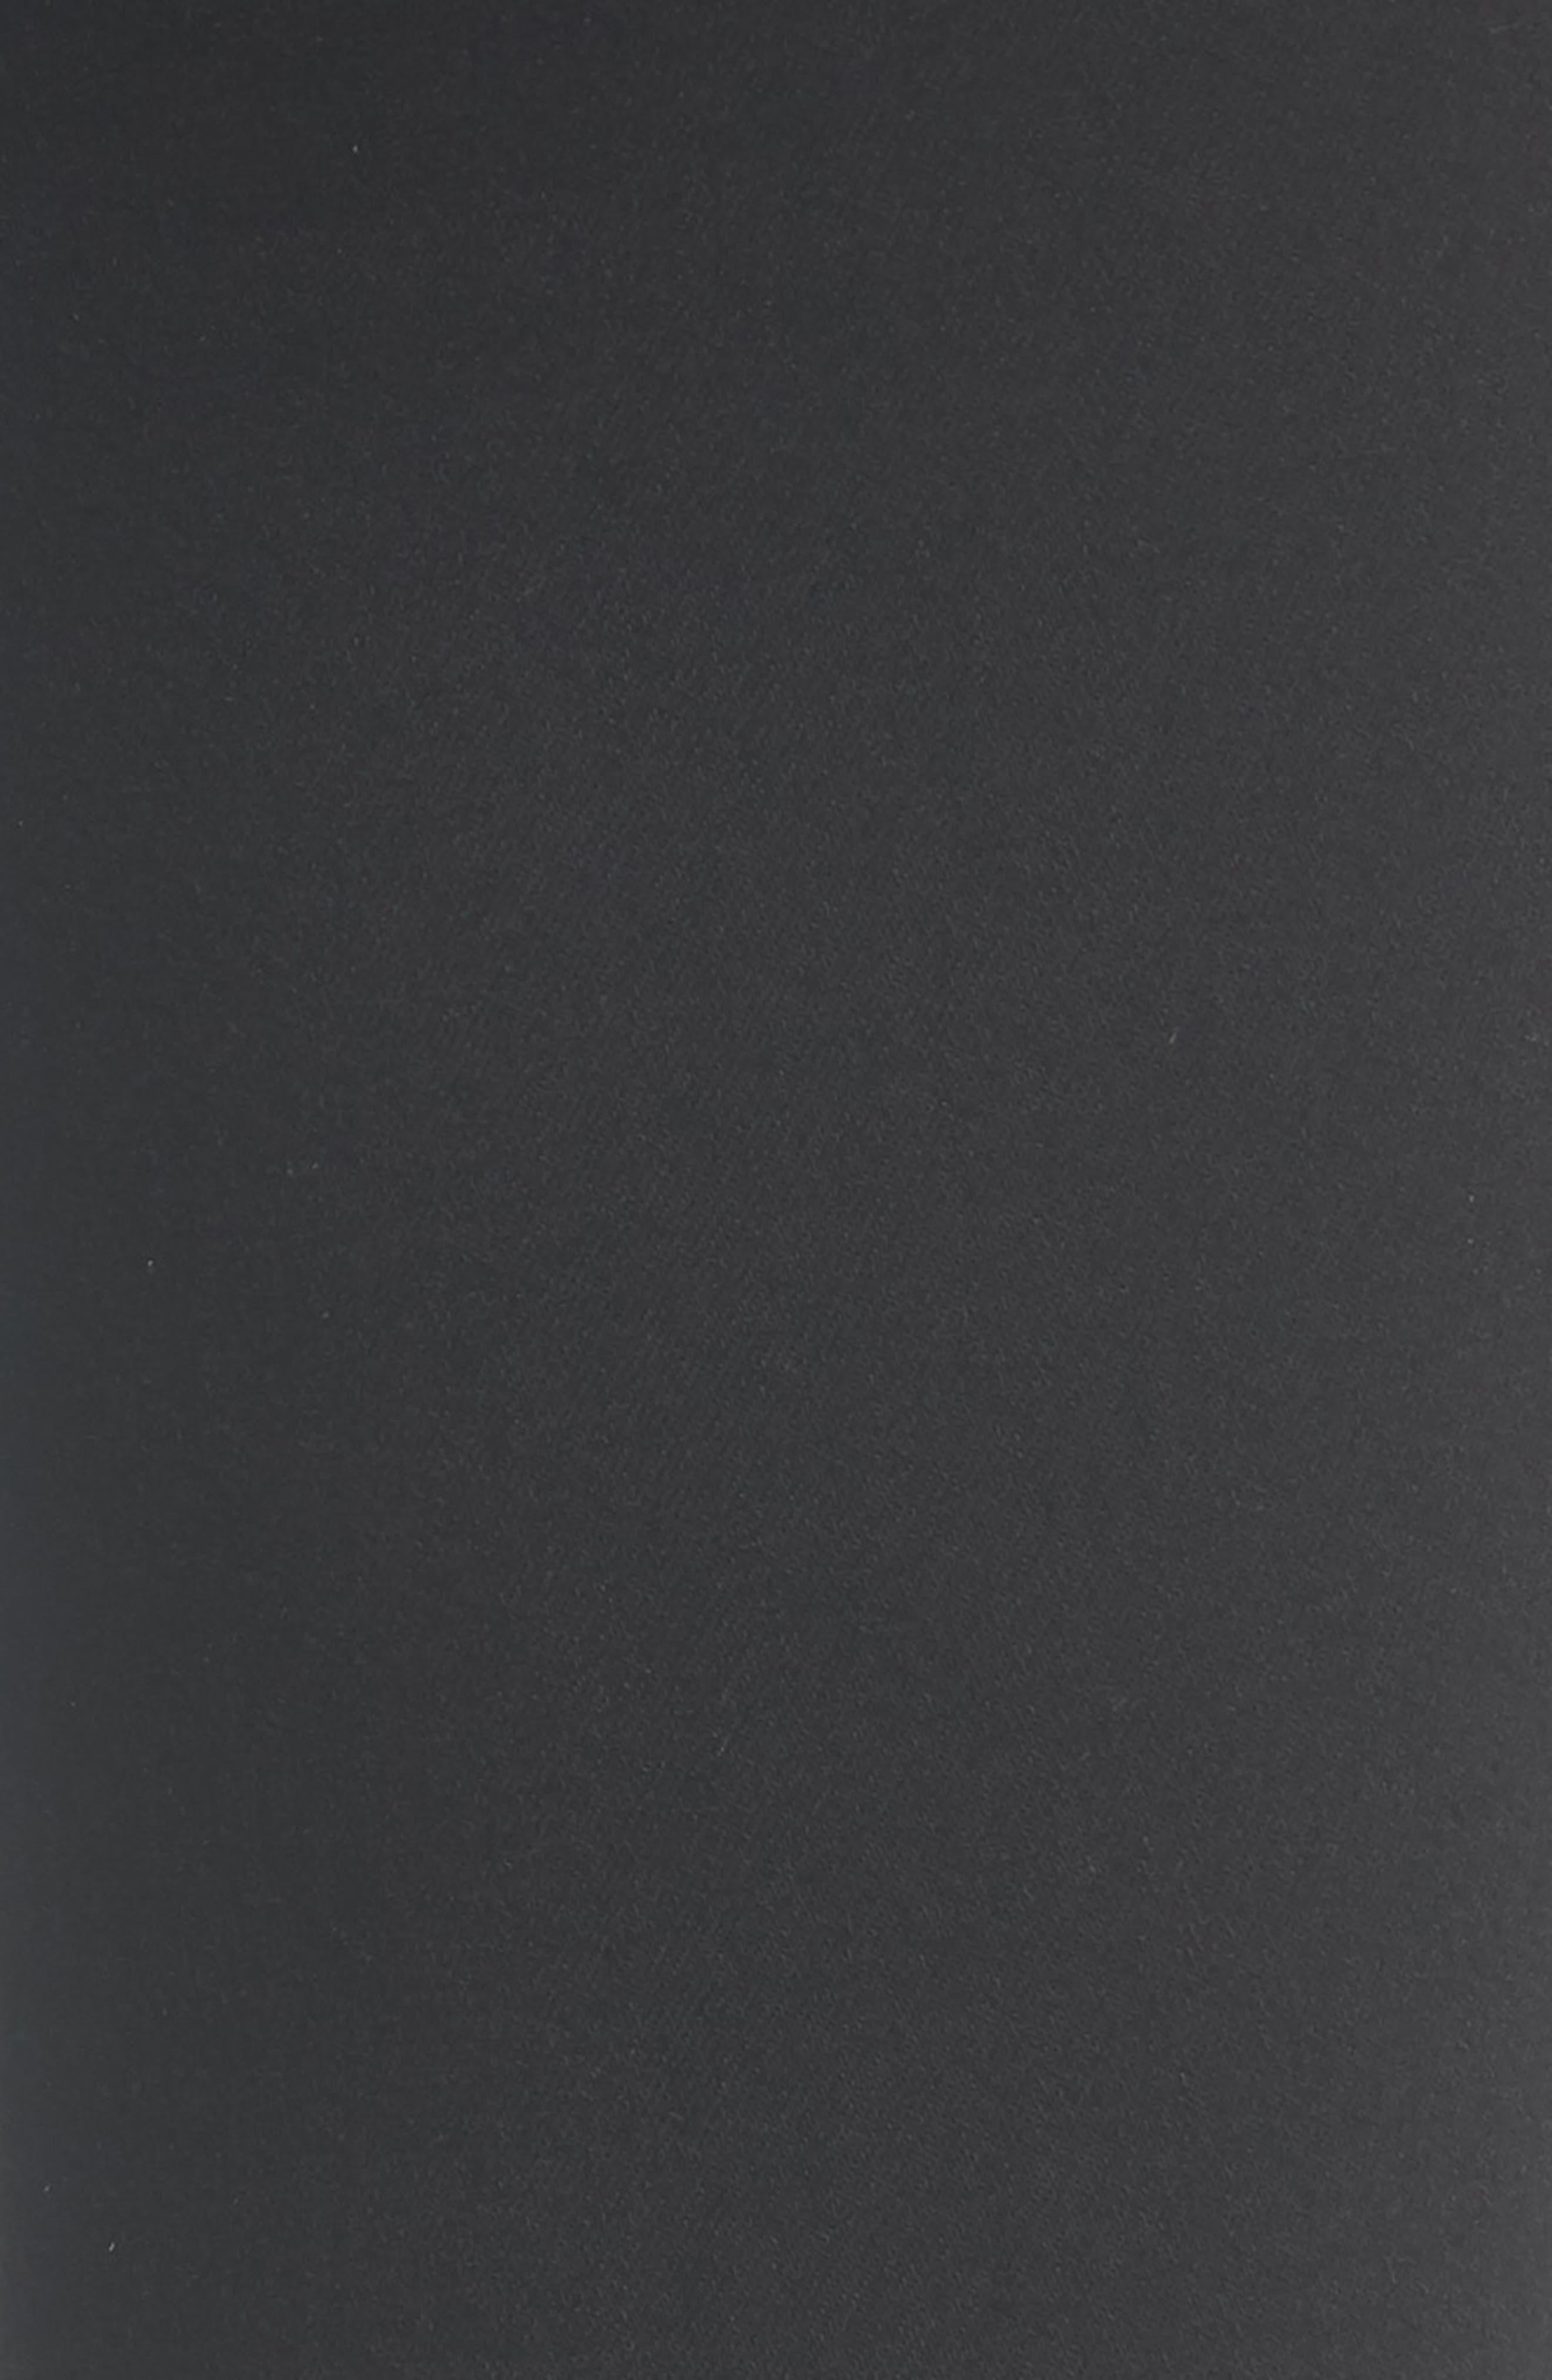 Transcend - Verdugo Ankle Ultra Skinny Jeans,                             Alternate thumbnail 7, color,                             BLACK SHADOW